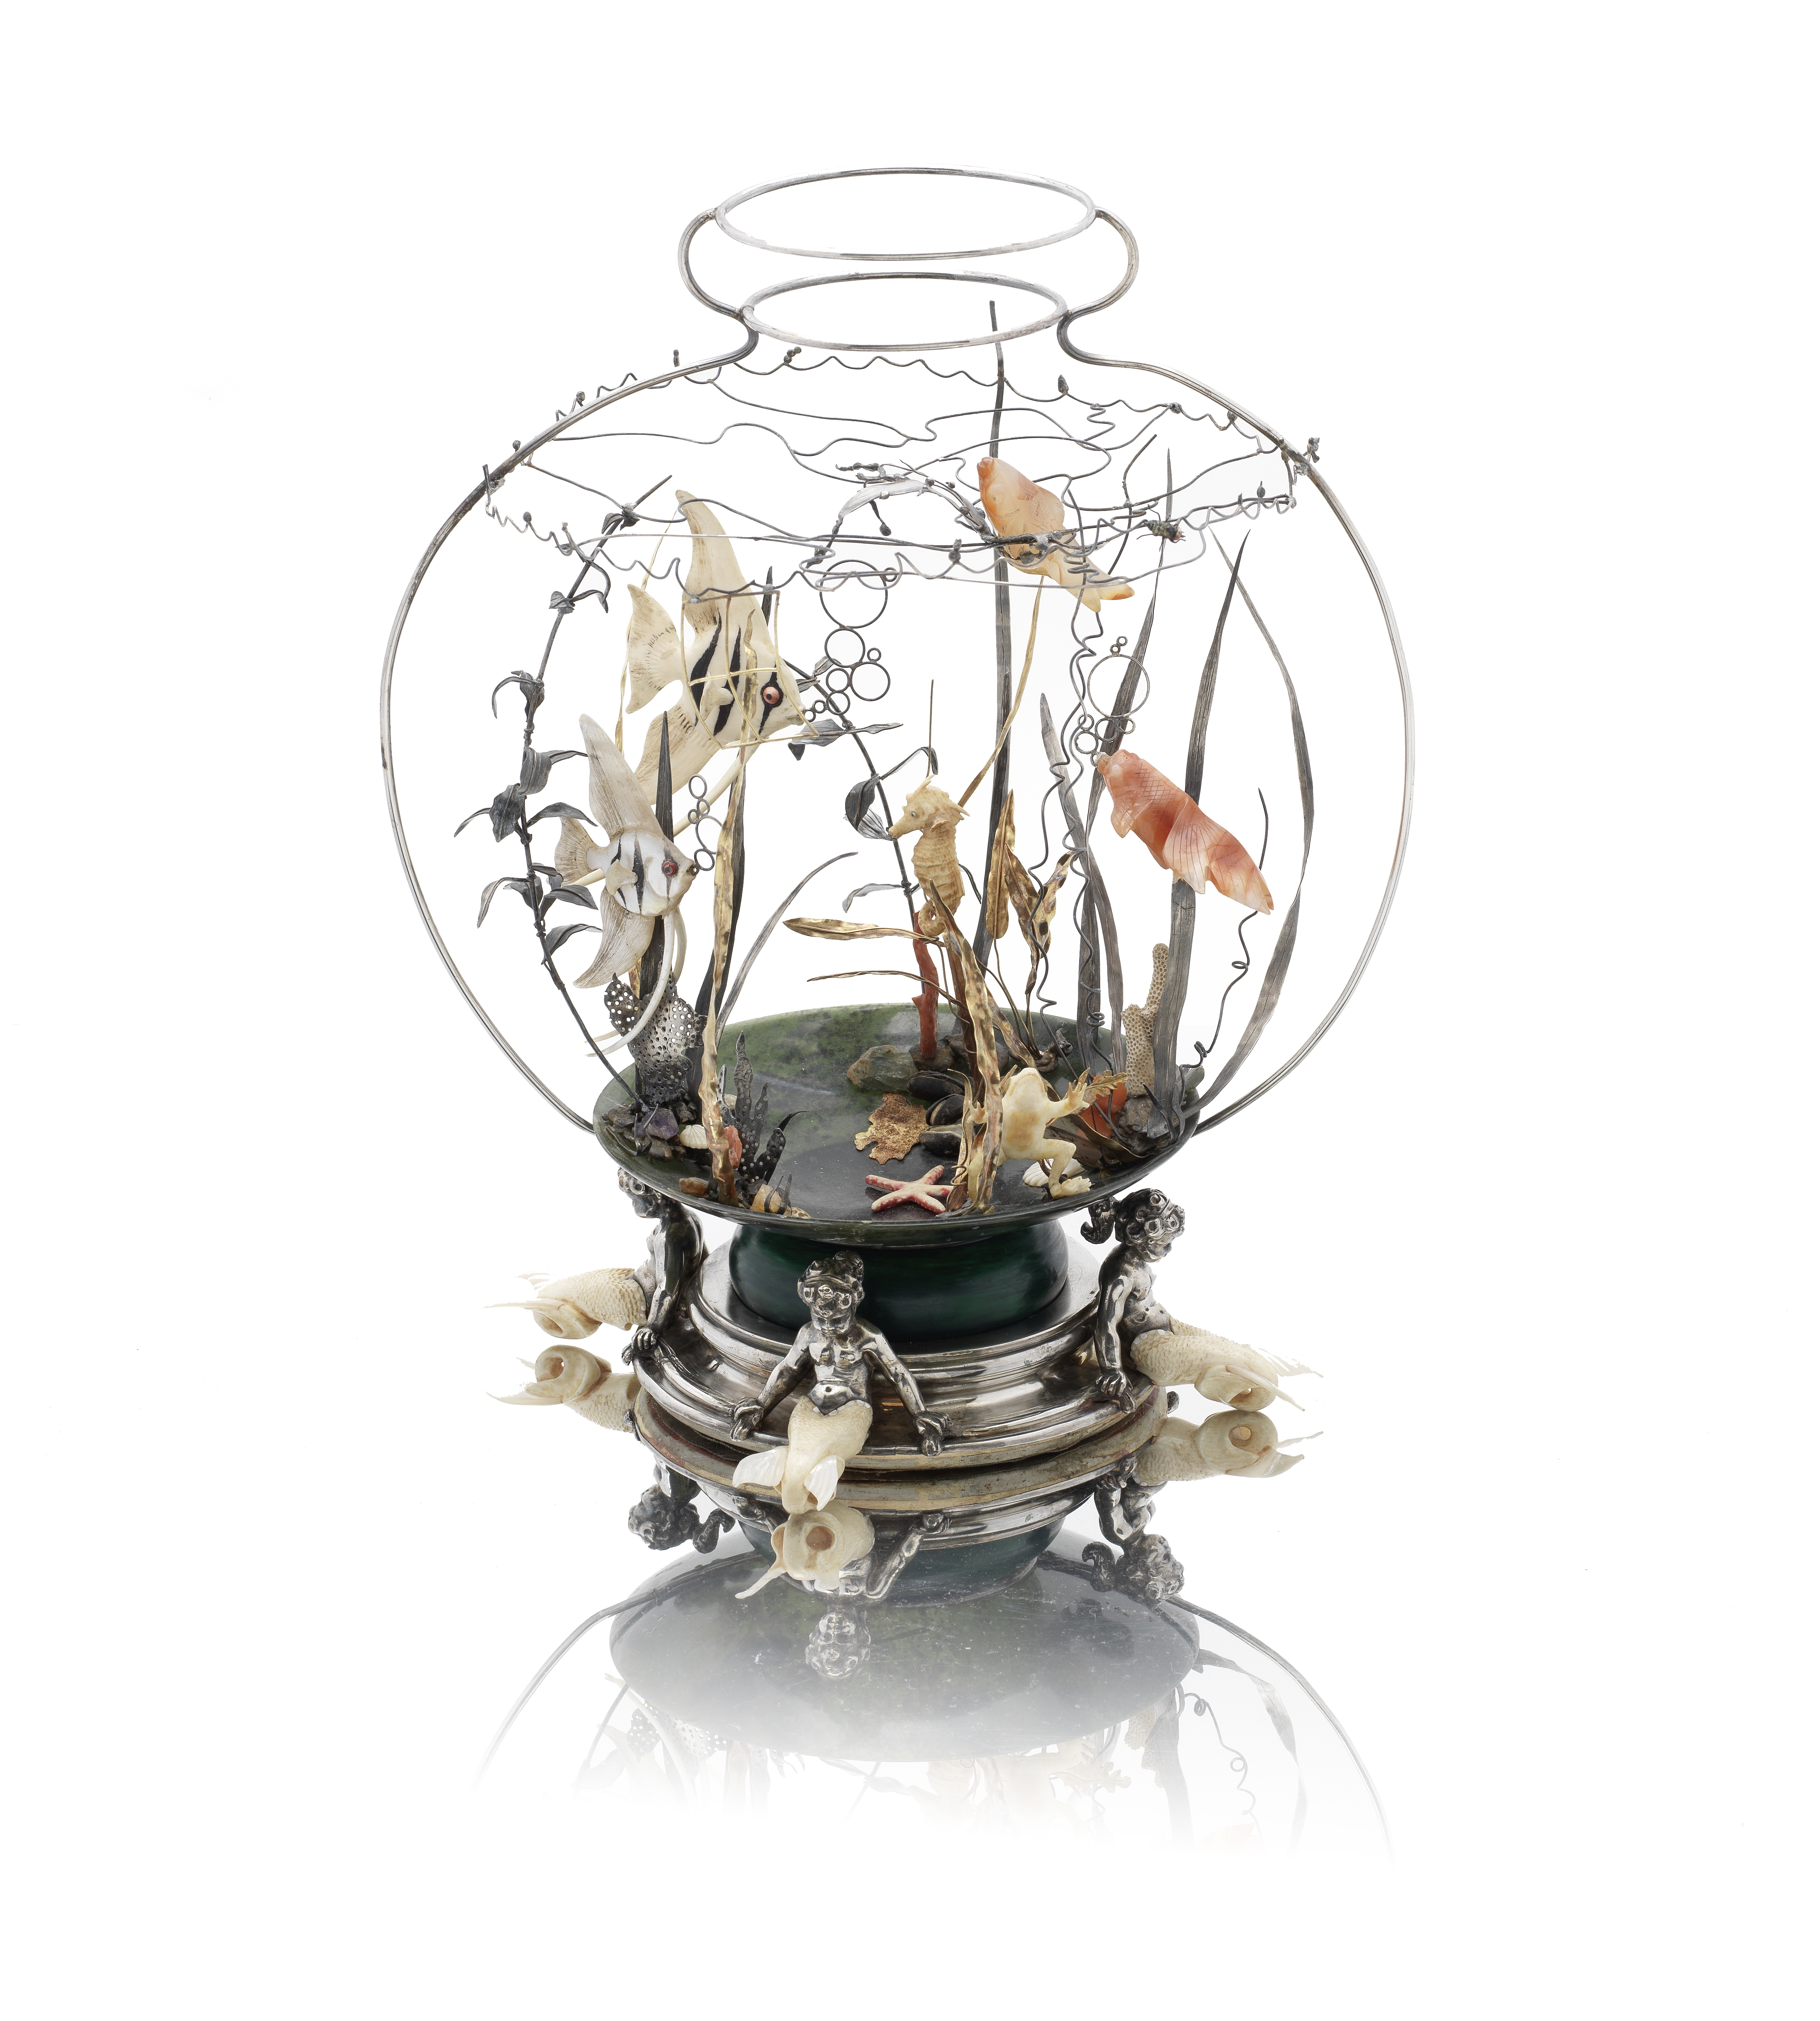 Lot 8 - An extraordinary silver, gold and hardstone fishbowl sculpture by Tétard Frères, Paris circa 1920